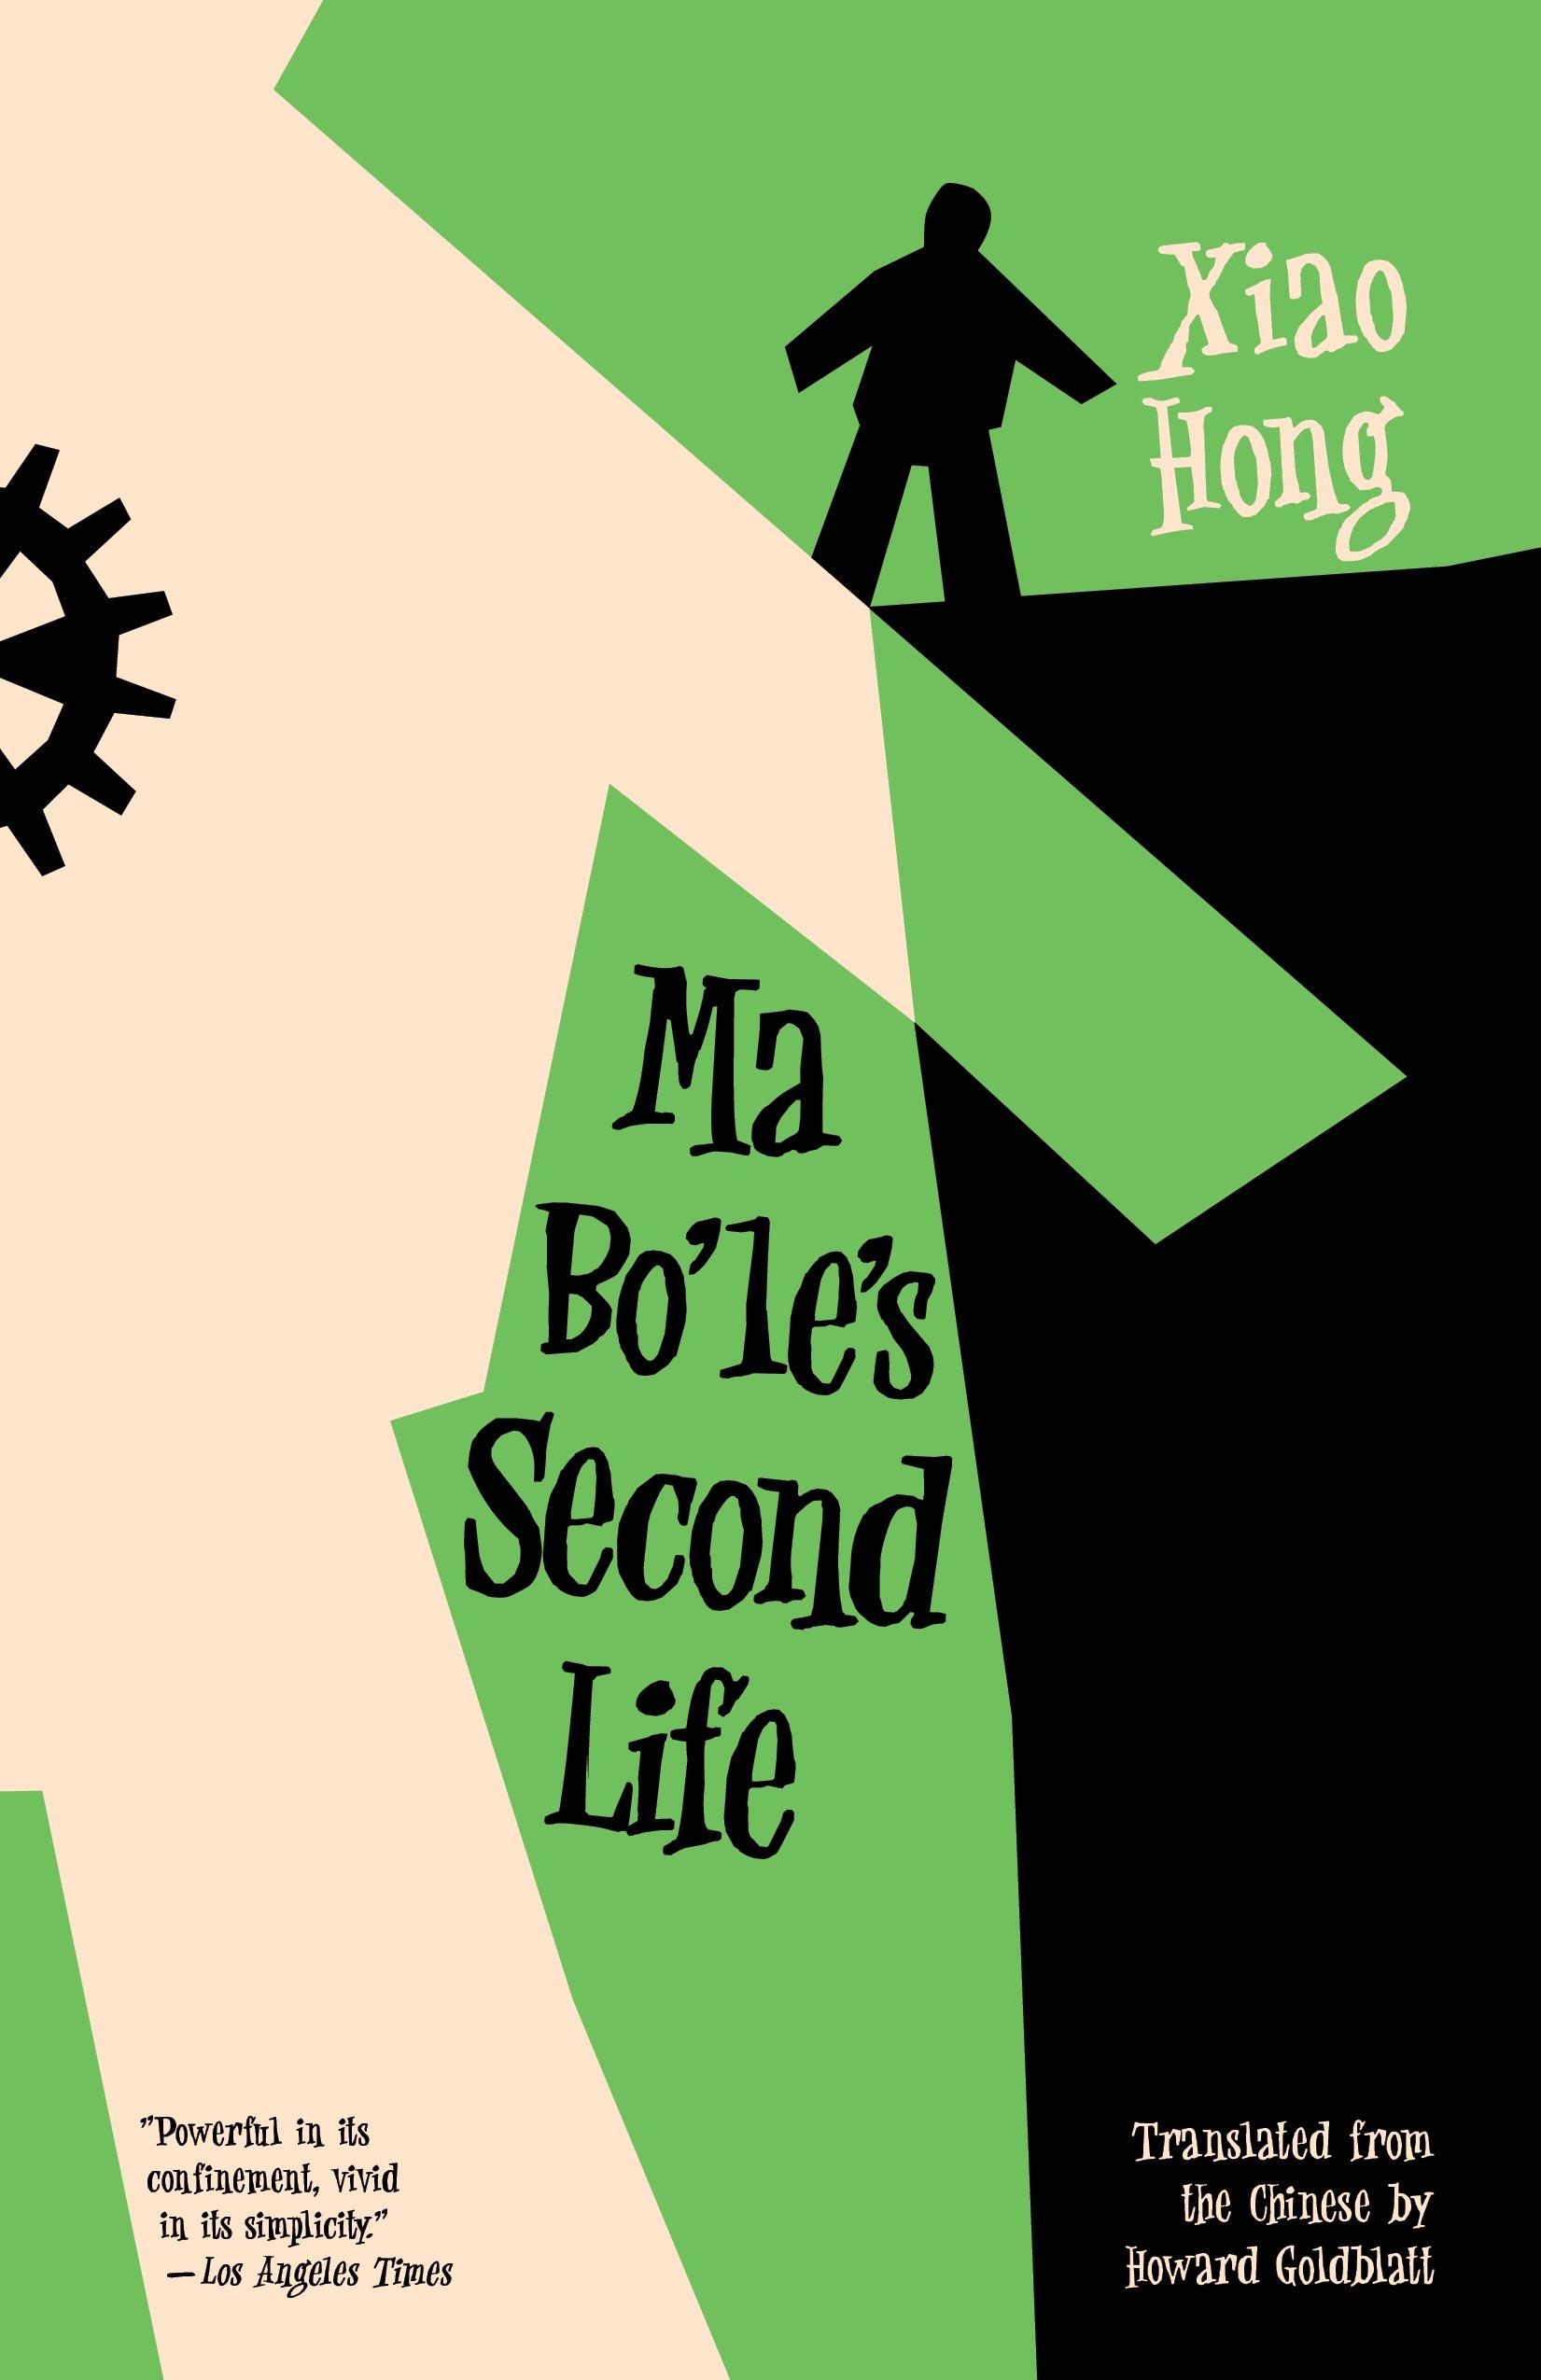 Ma Boles Second Life  Xiao Hong  Full Stop